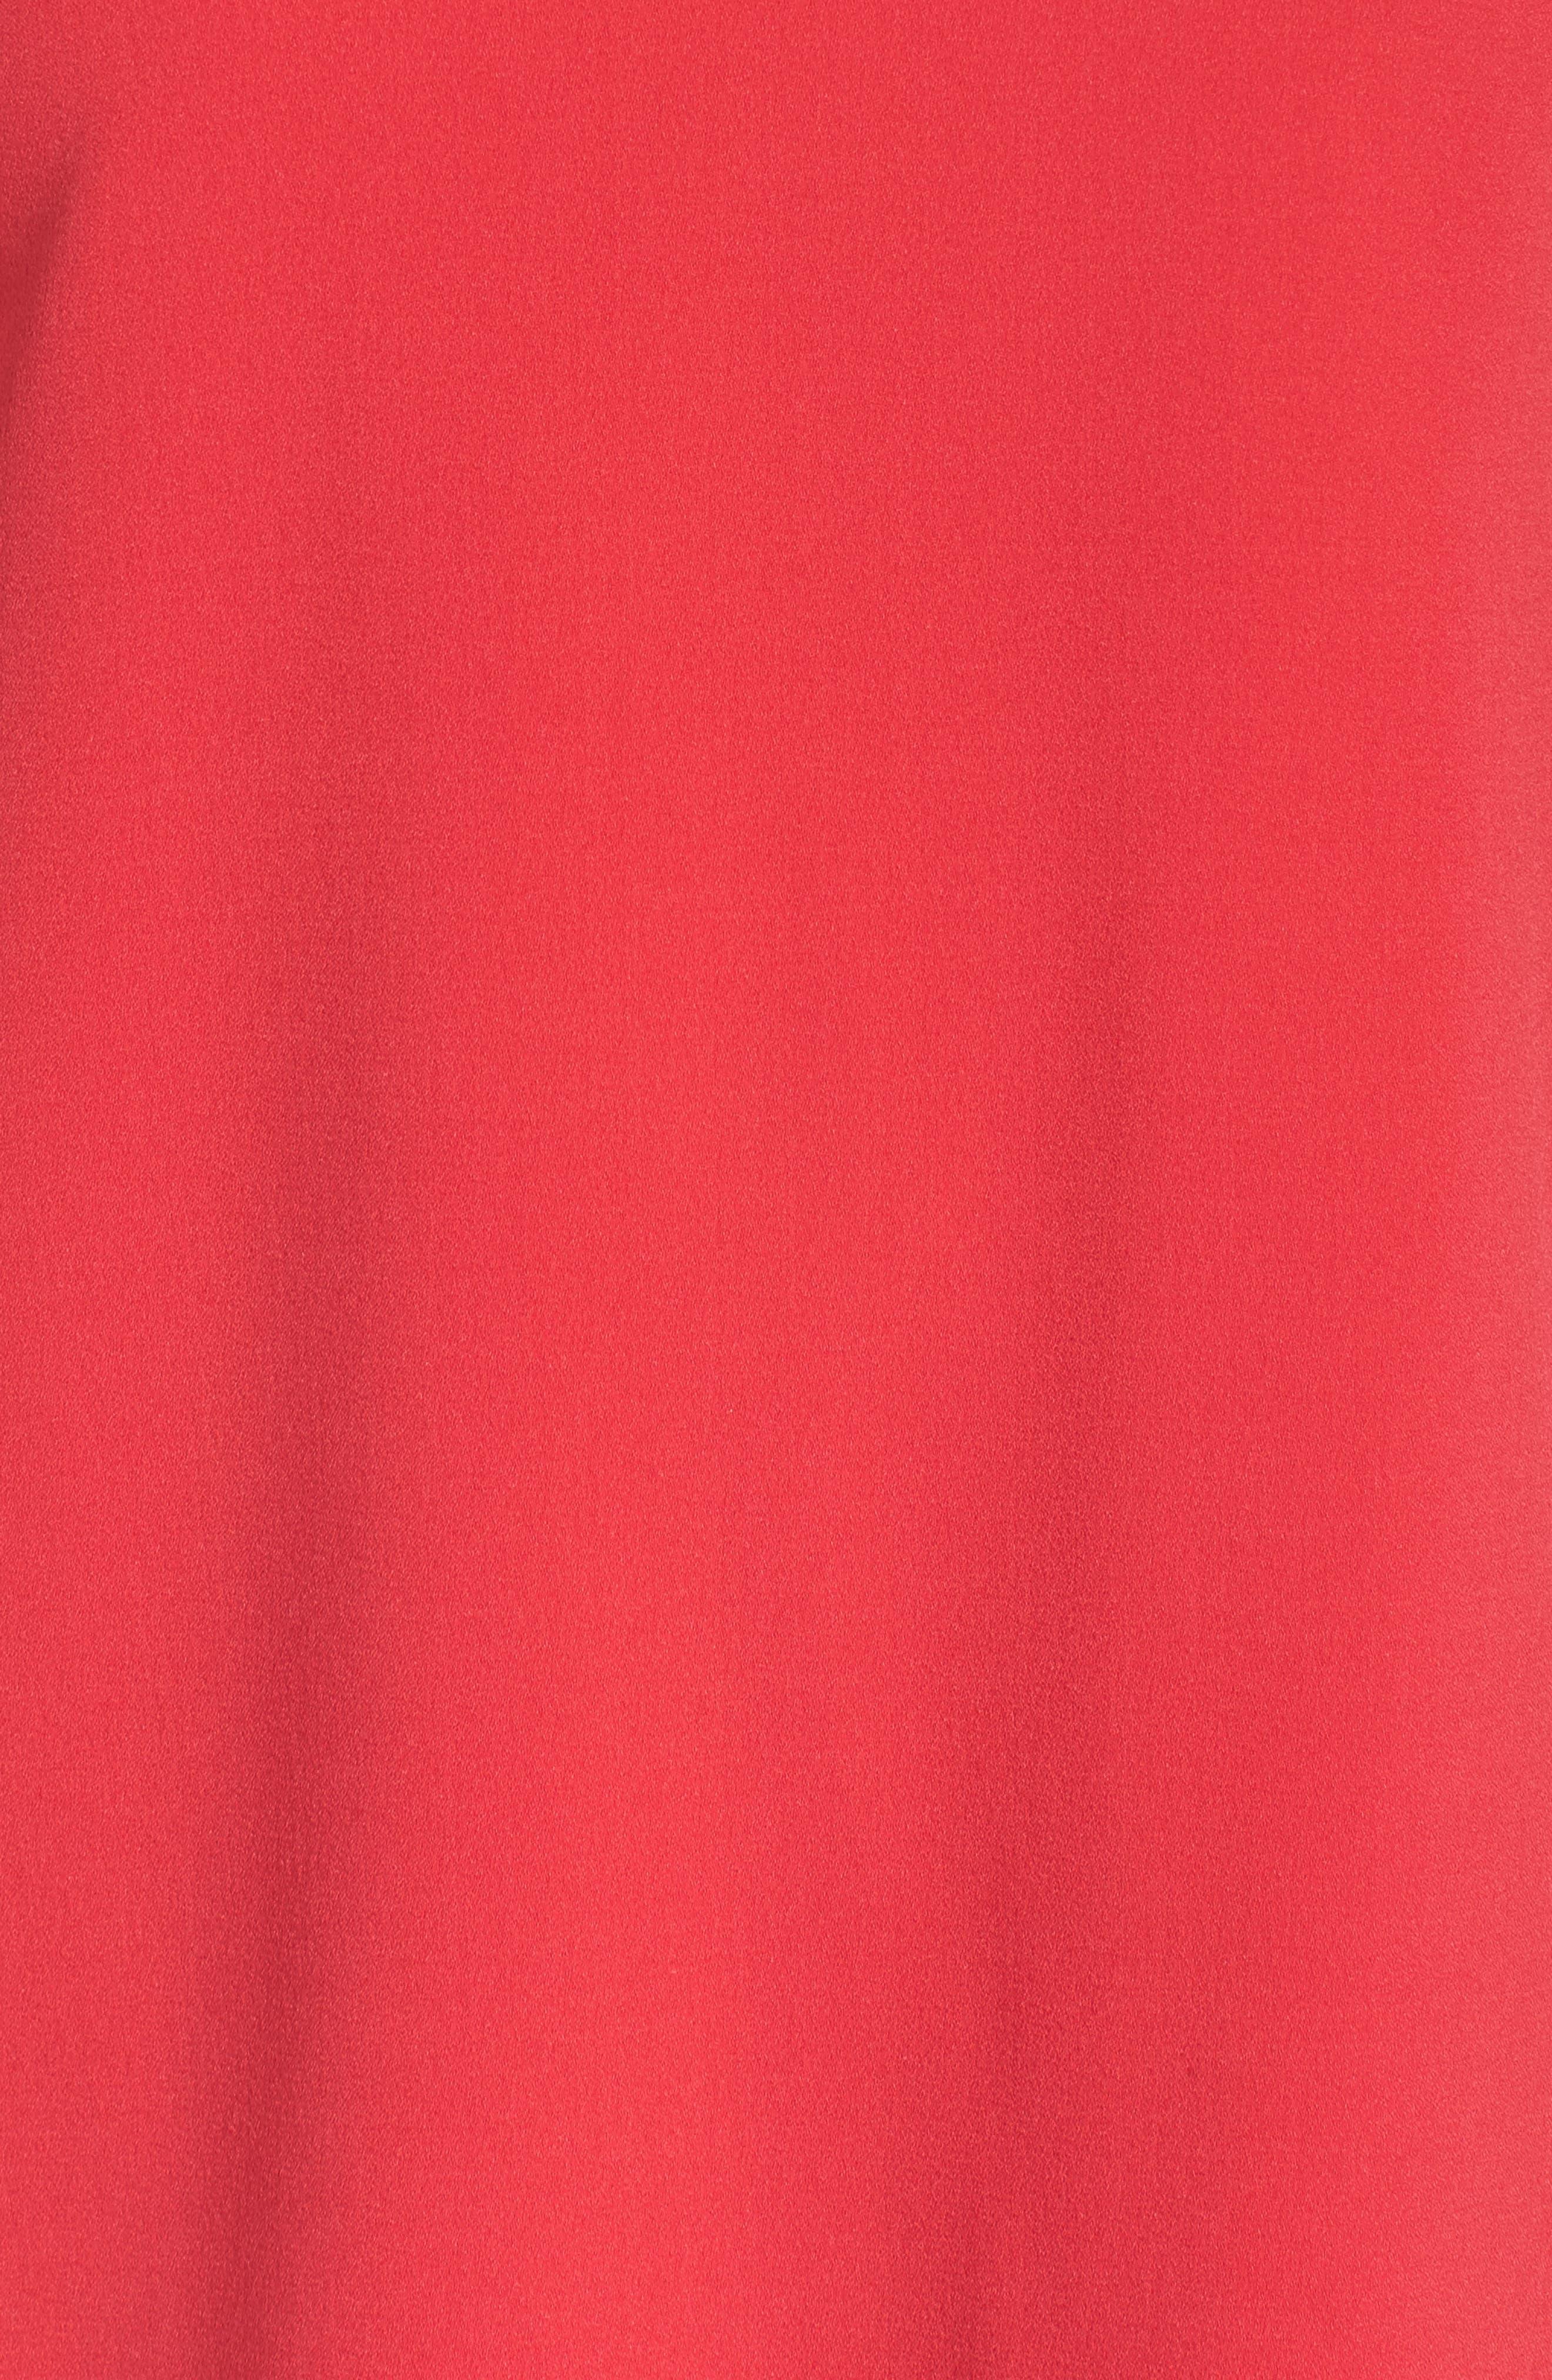 Bell Sleeve Crepe Shift Dress,                             Alternate thumbnail 6, color,                             Pink